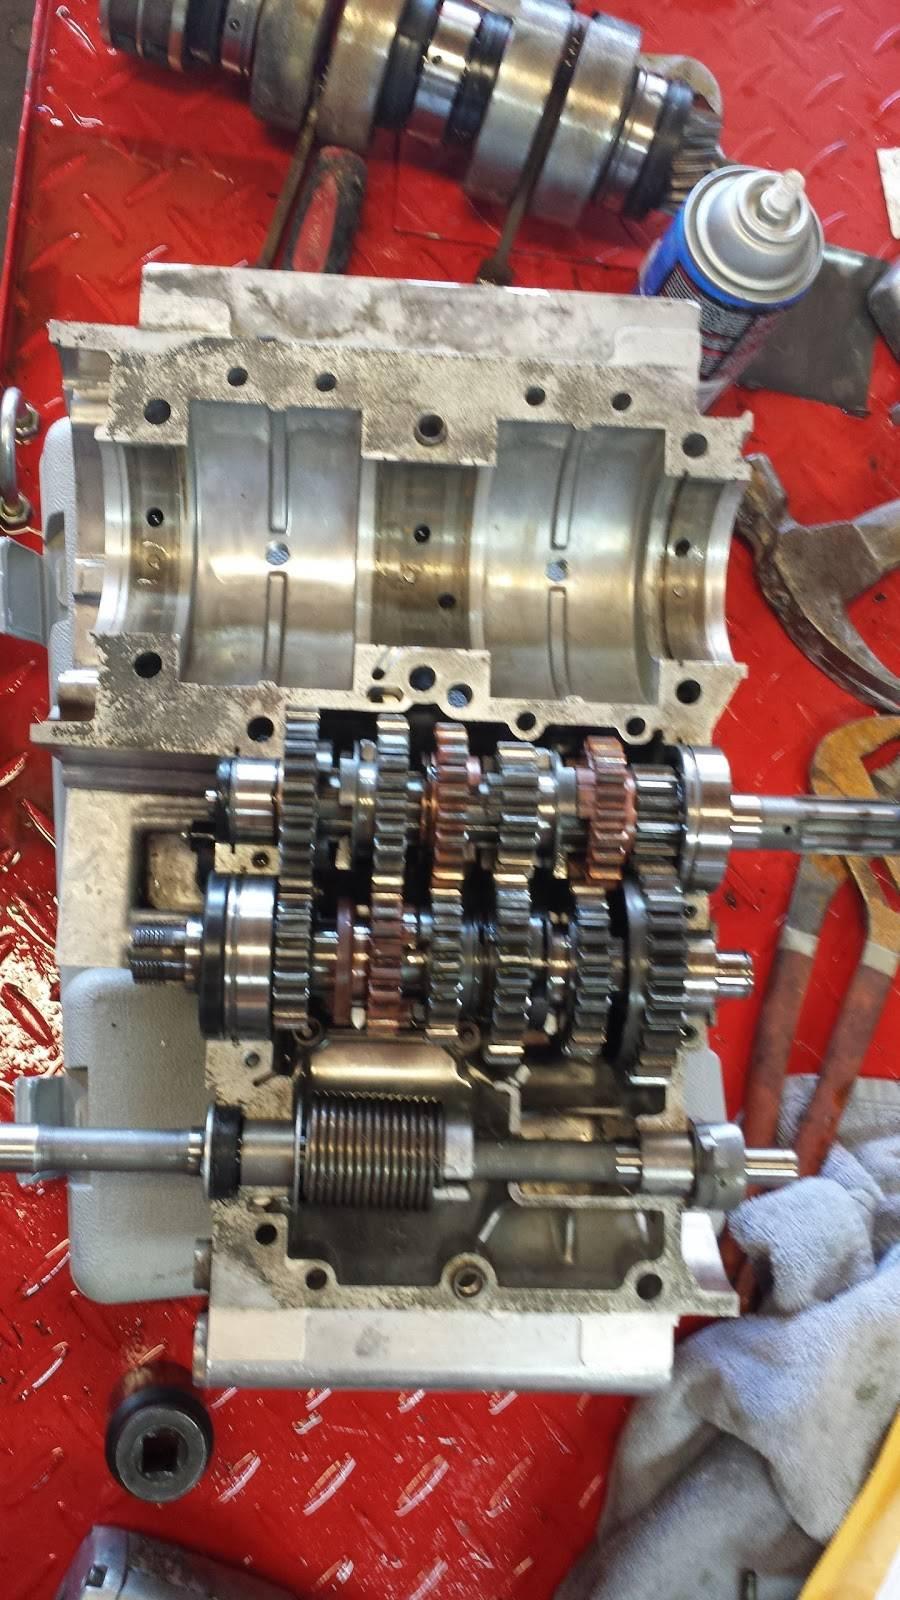 Rio Rancho Motorcycle ATV Repair - car repair  | Photo 7 of 7 | Address: 425 Bermuda Dr SE, Rio Rancho, NM 87124, USA | Phone: (505) 300-7982